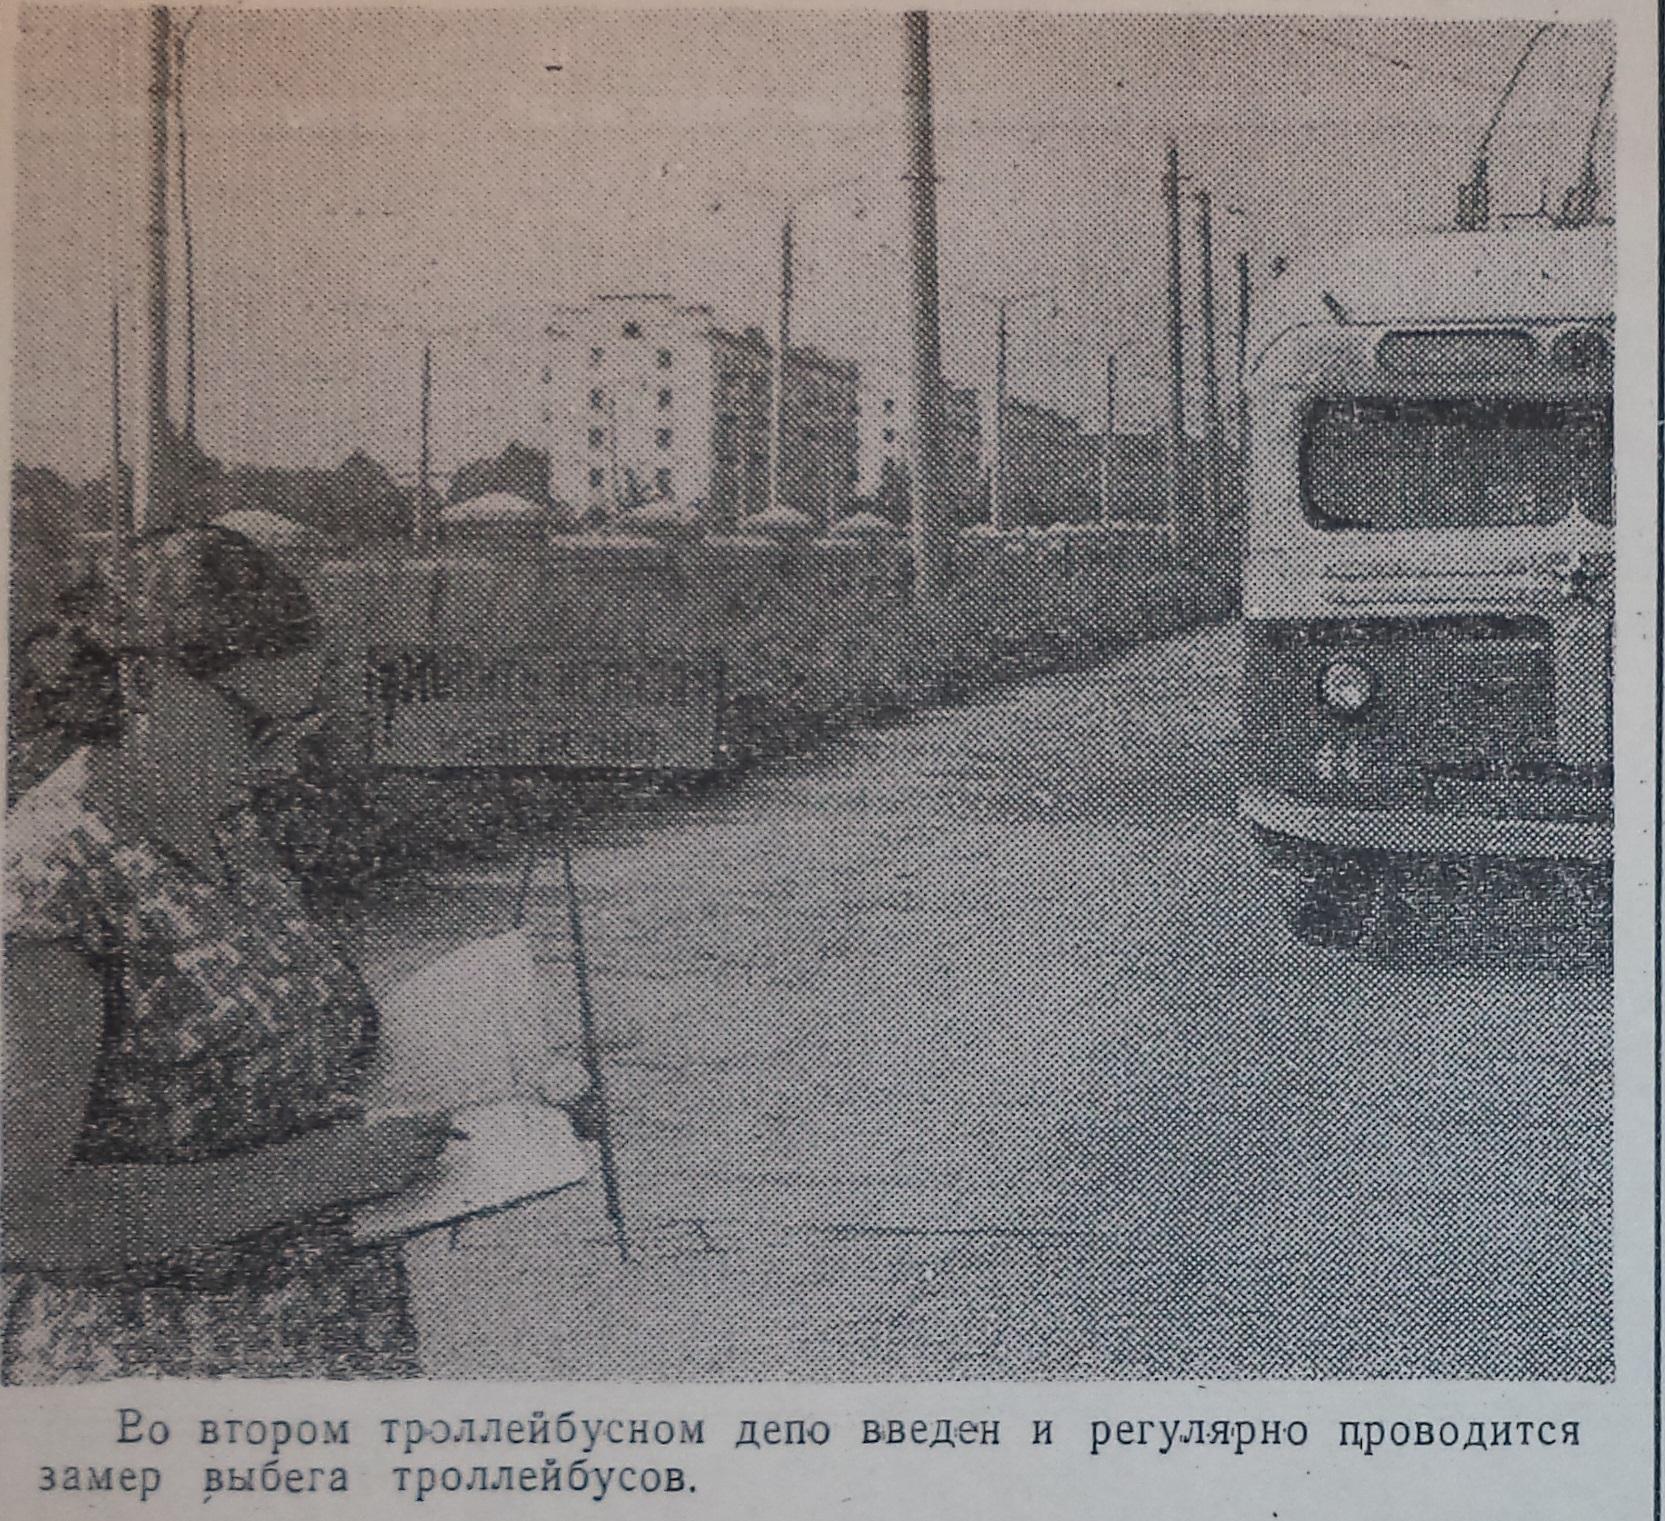 Гагарина-фото-05-ЗРР-1966-09-19-депо трол. и ул. Гаг.